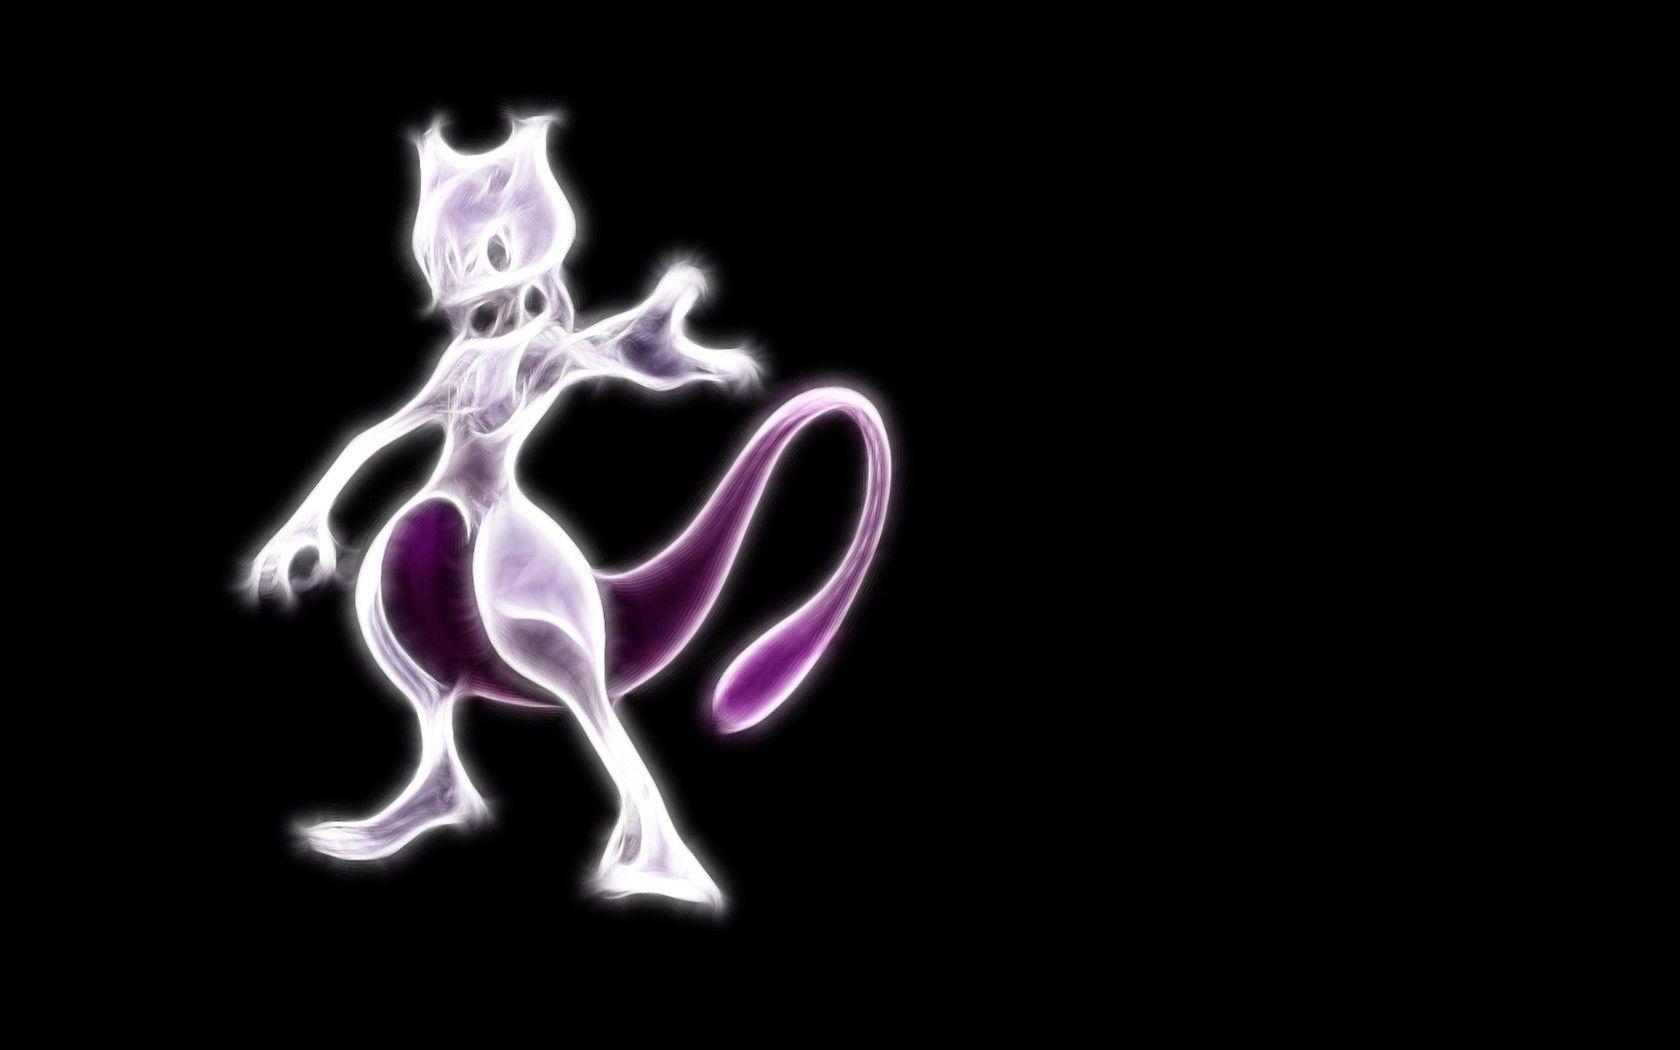 Pokemon Mewtwo Wallpapers 1680×1050 Mewtwo Wallpapers (27